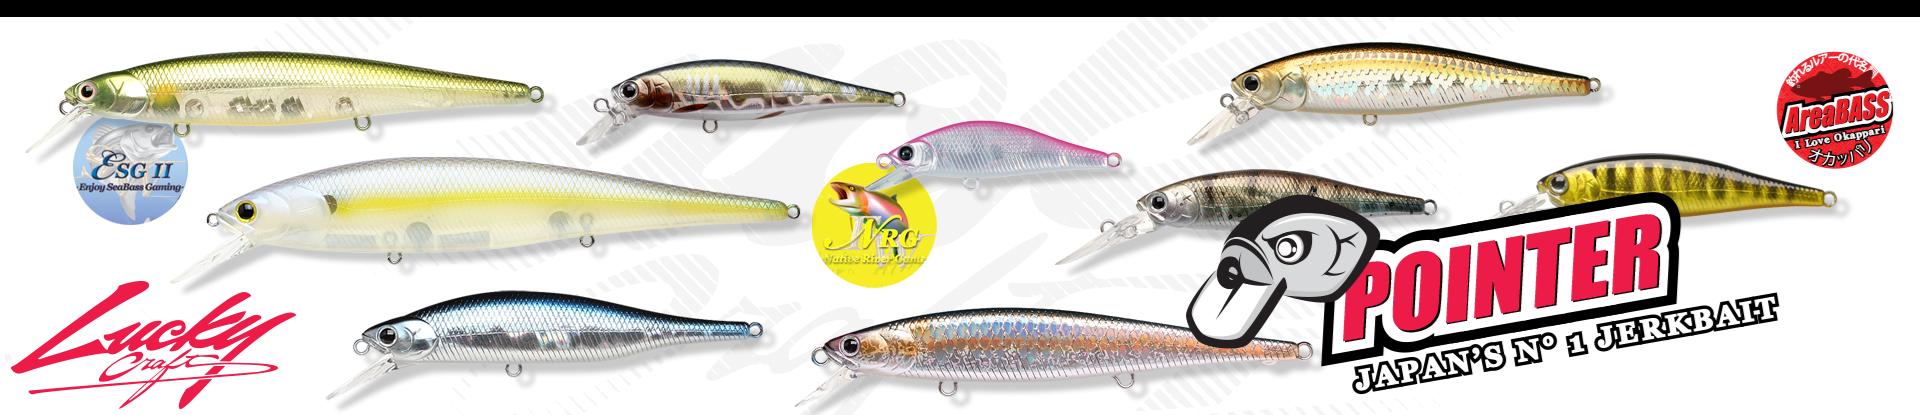 pointer, jerk, jerkbait, minnow, trota, apertura 2019, pesca in torrente, pesca in mare, saltwater, freshwater, trout